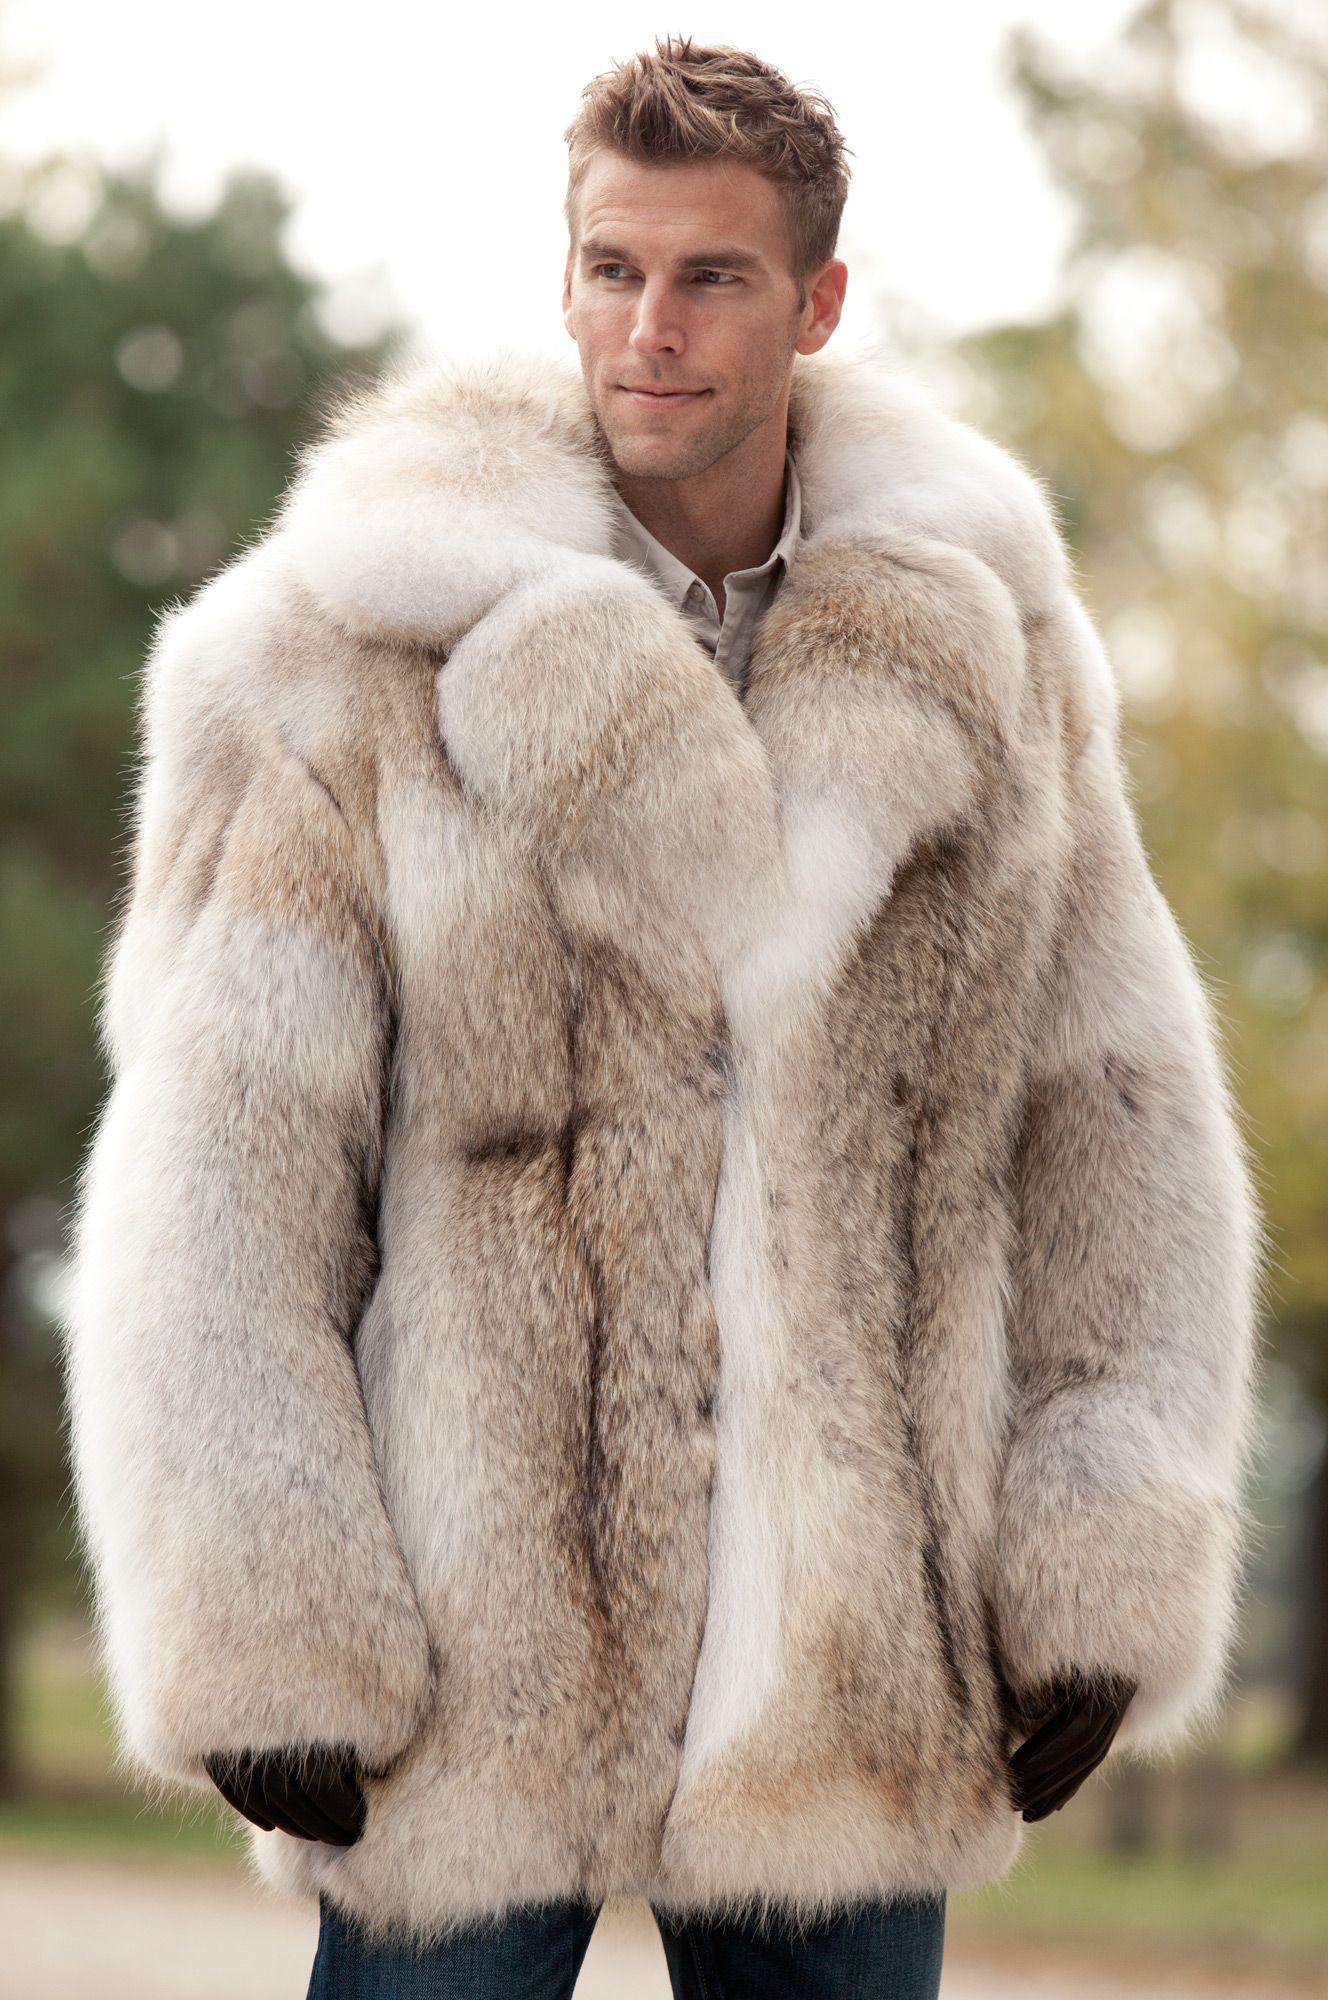 f7b58e21f15 Zack Coyote Fur Jacket  12127. Zack Coyote Fur Jacket  12127 White Faux Fur  Coat